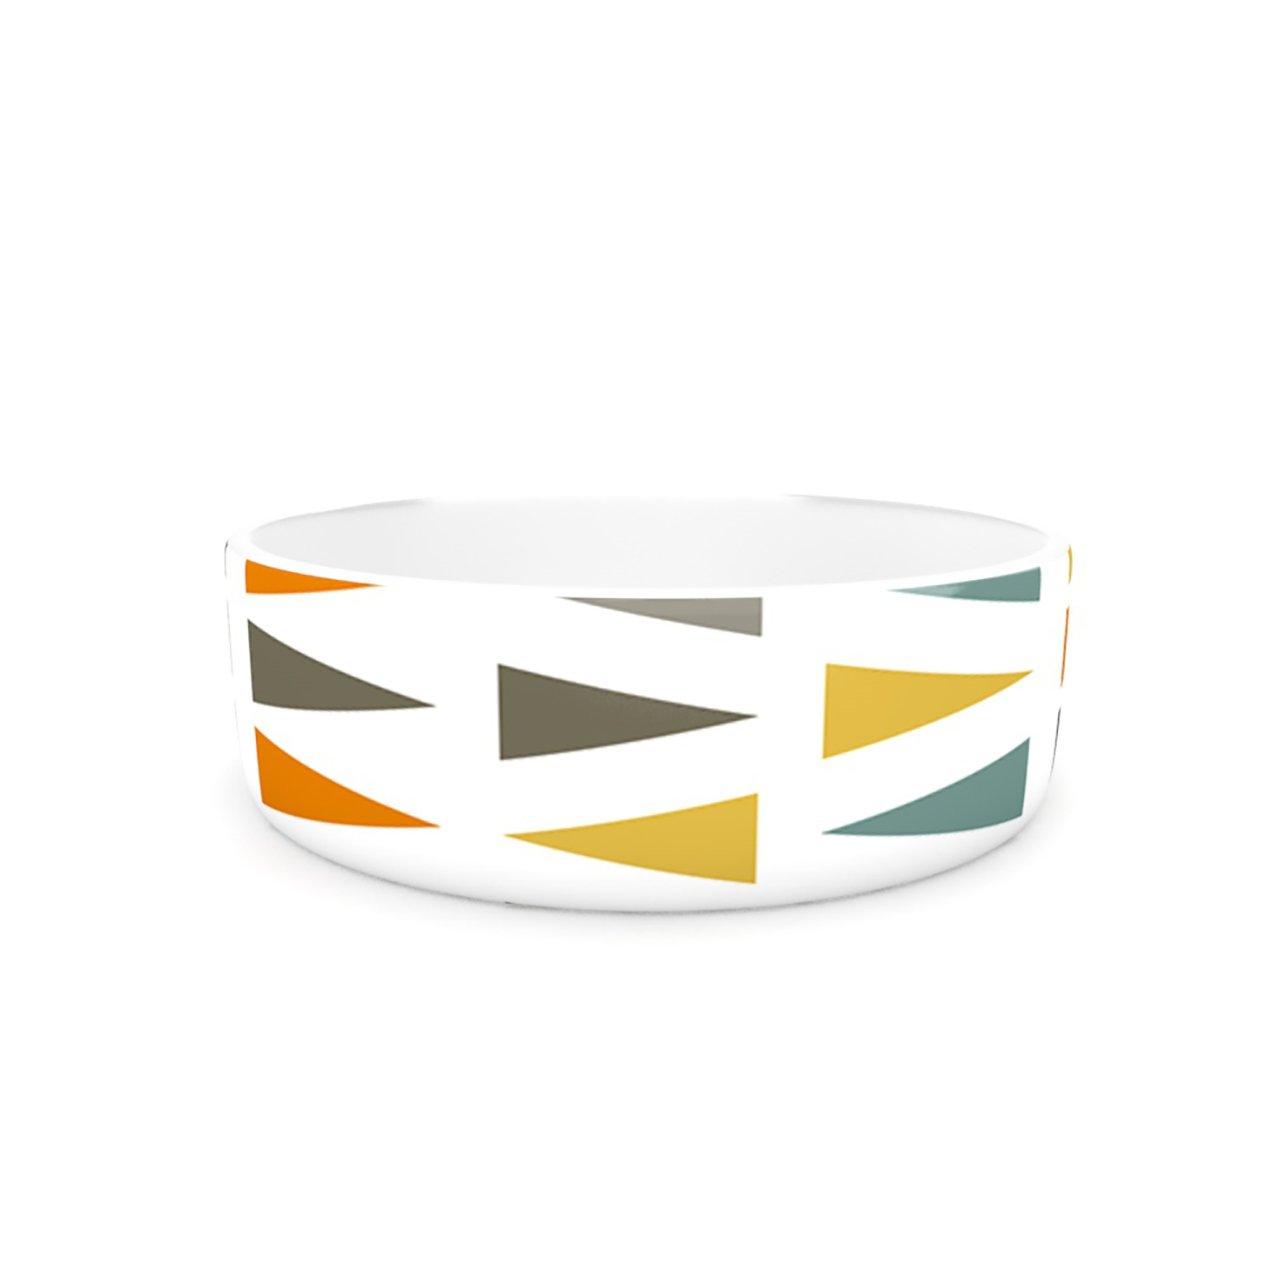 Kess InHouse Pellerina Design Stacked Geo Pet Bowl, 7-Inch, White Triangles